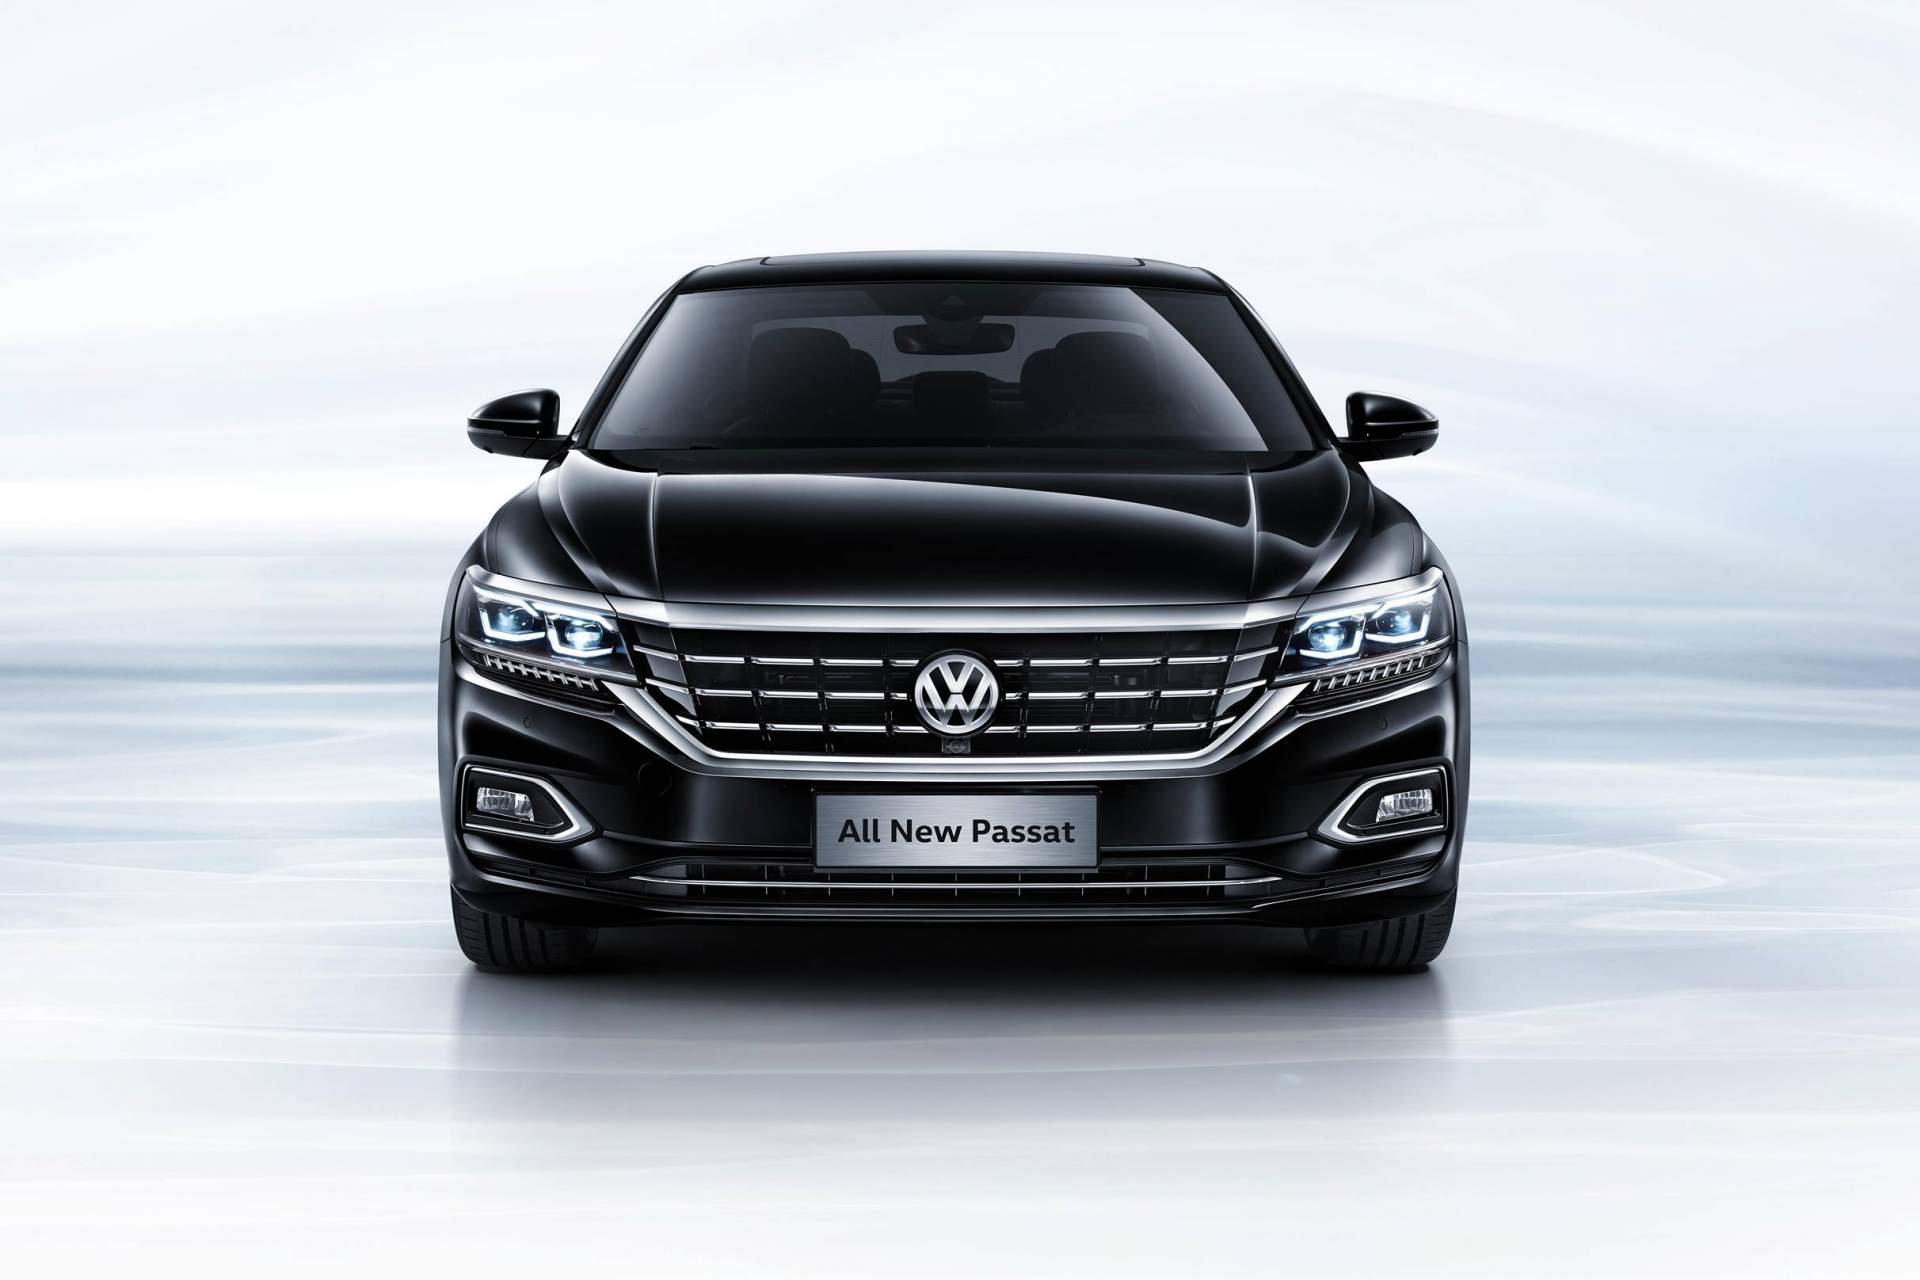 2019_VW_Passat_NMS_0009